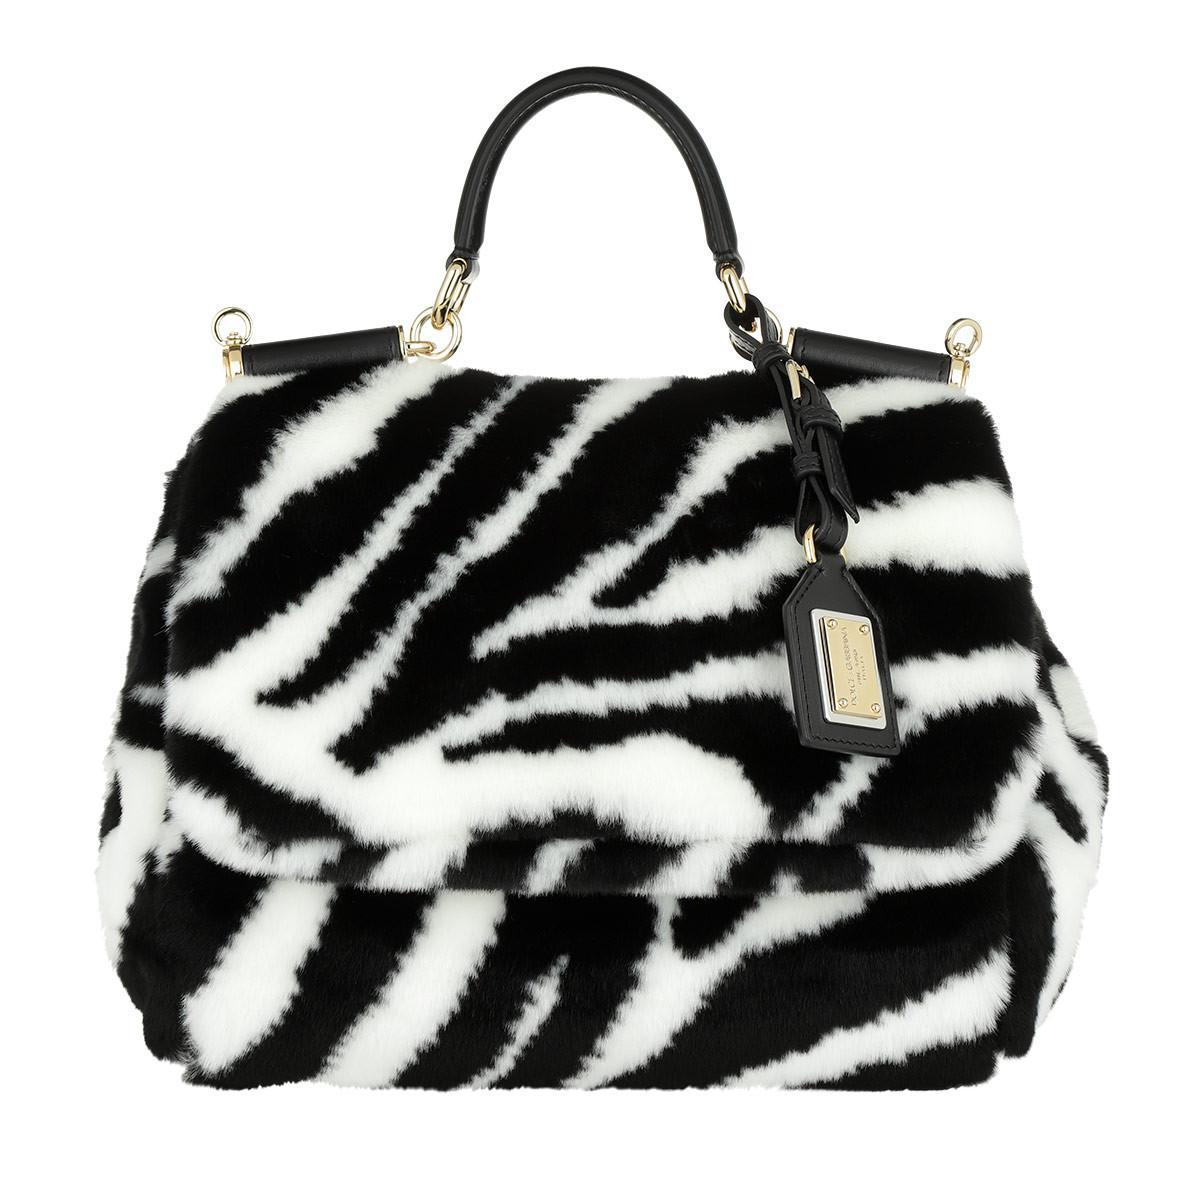 223f82111a8b Dolce   Gabbana Sicily Soft Bag Zebra Faux Fur Black white in Black ...